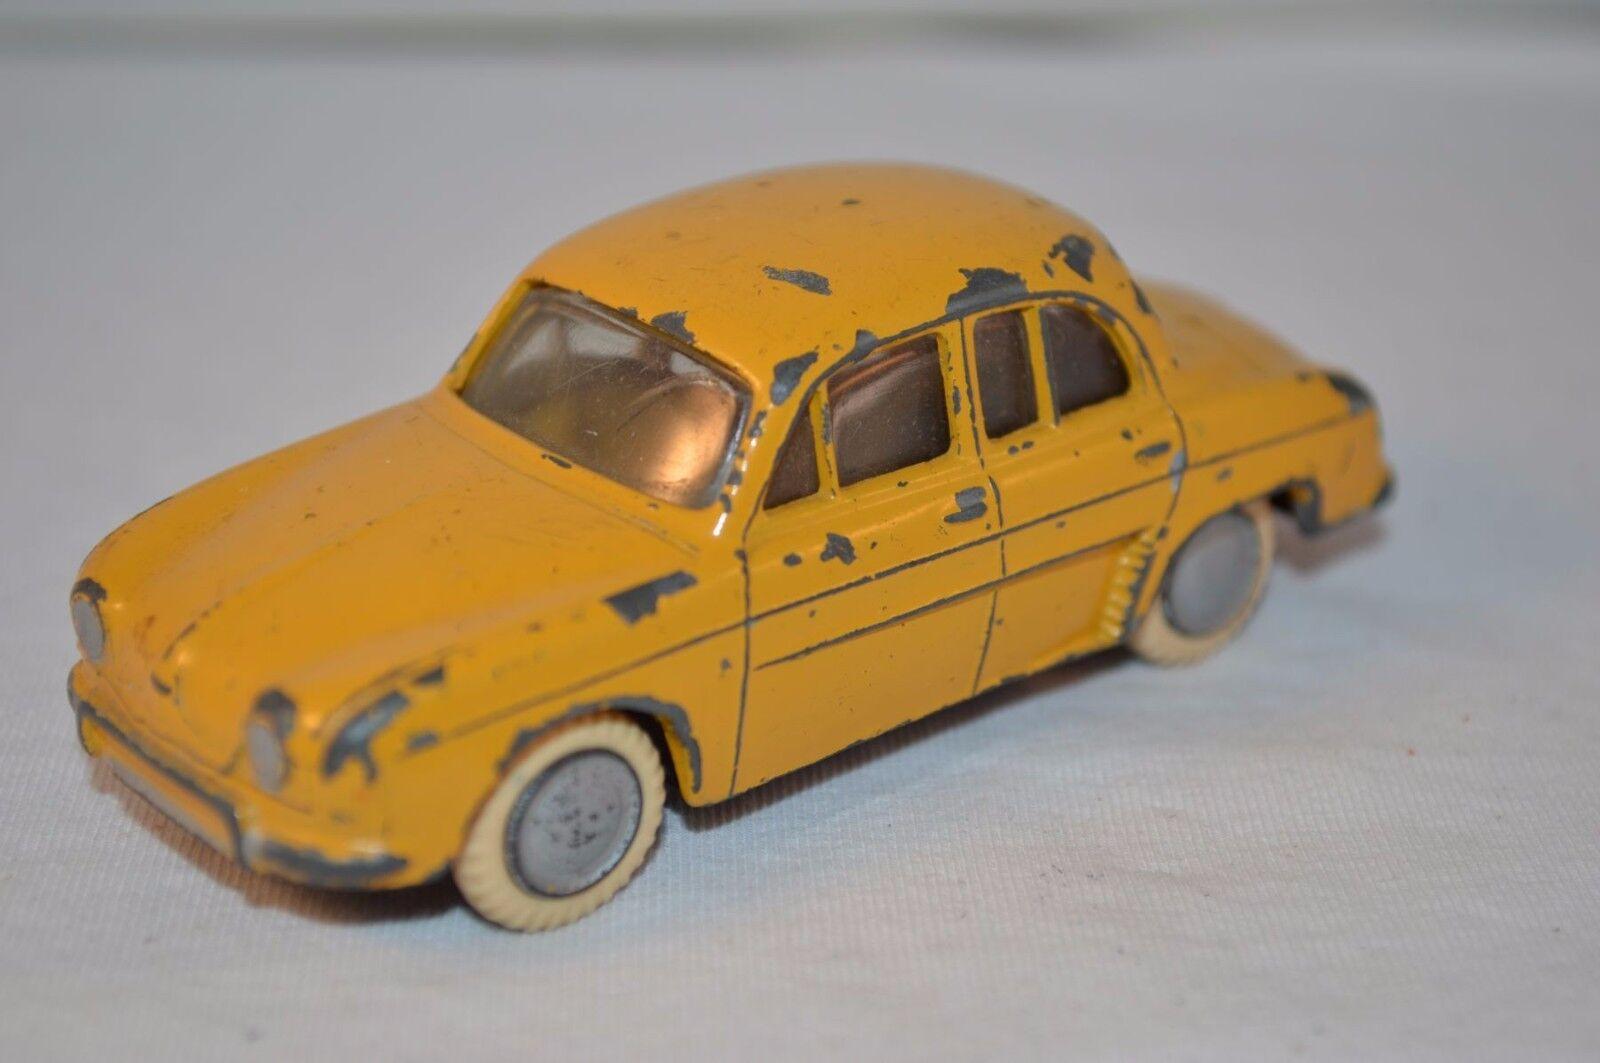 Lion Car Renault Dauphine amarillo in excellent original condition made in Holland